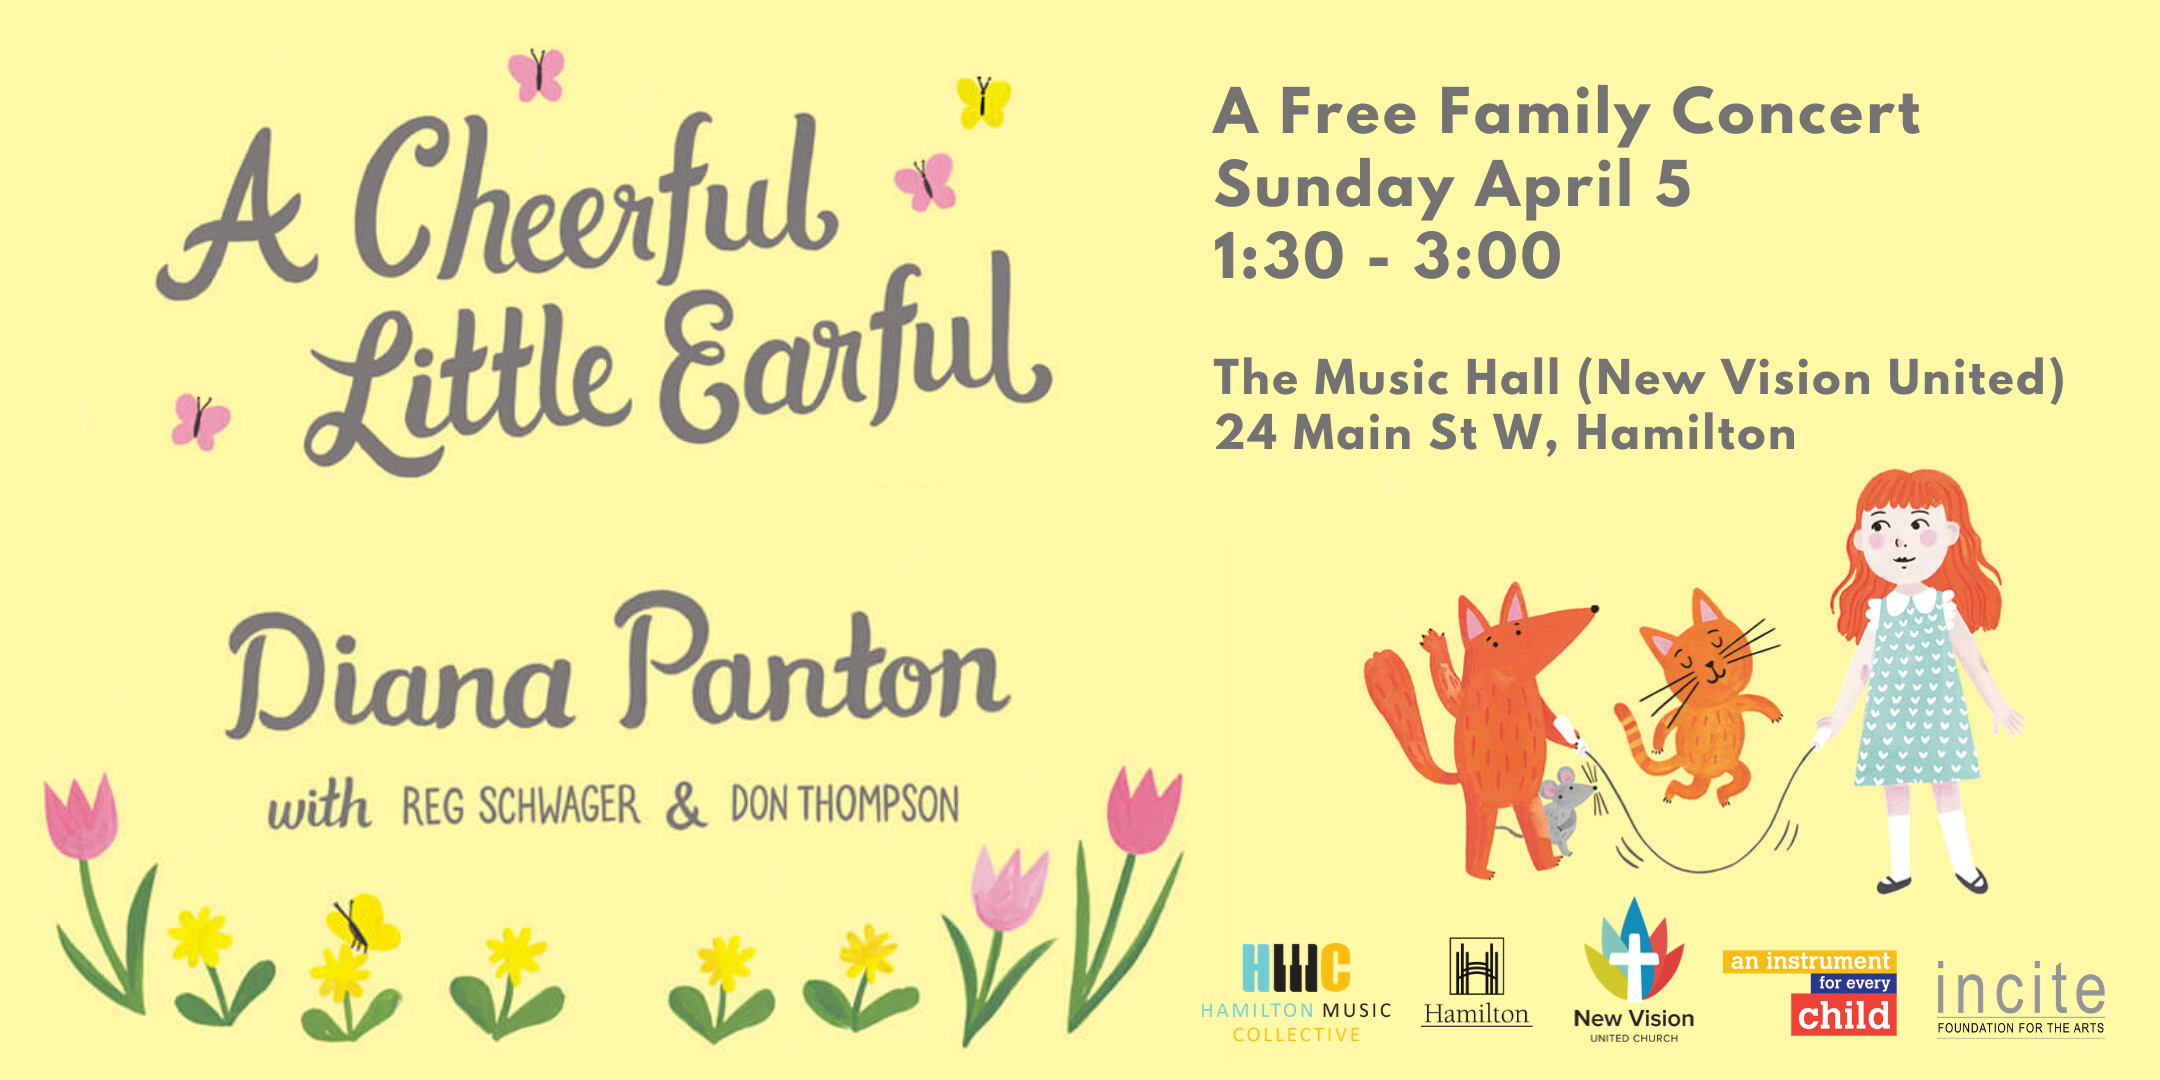 Diana Panton & HMC Present: A Free Spring Family Concert